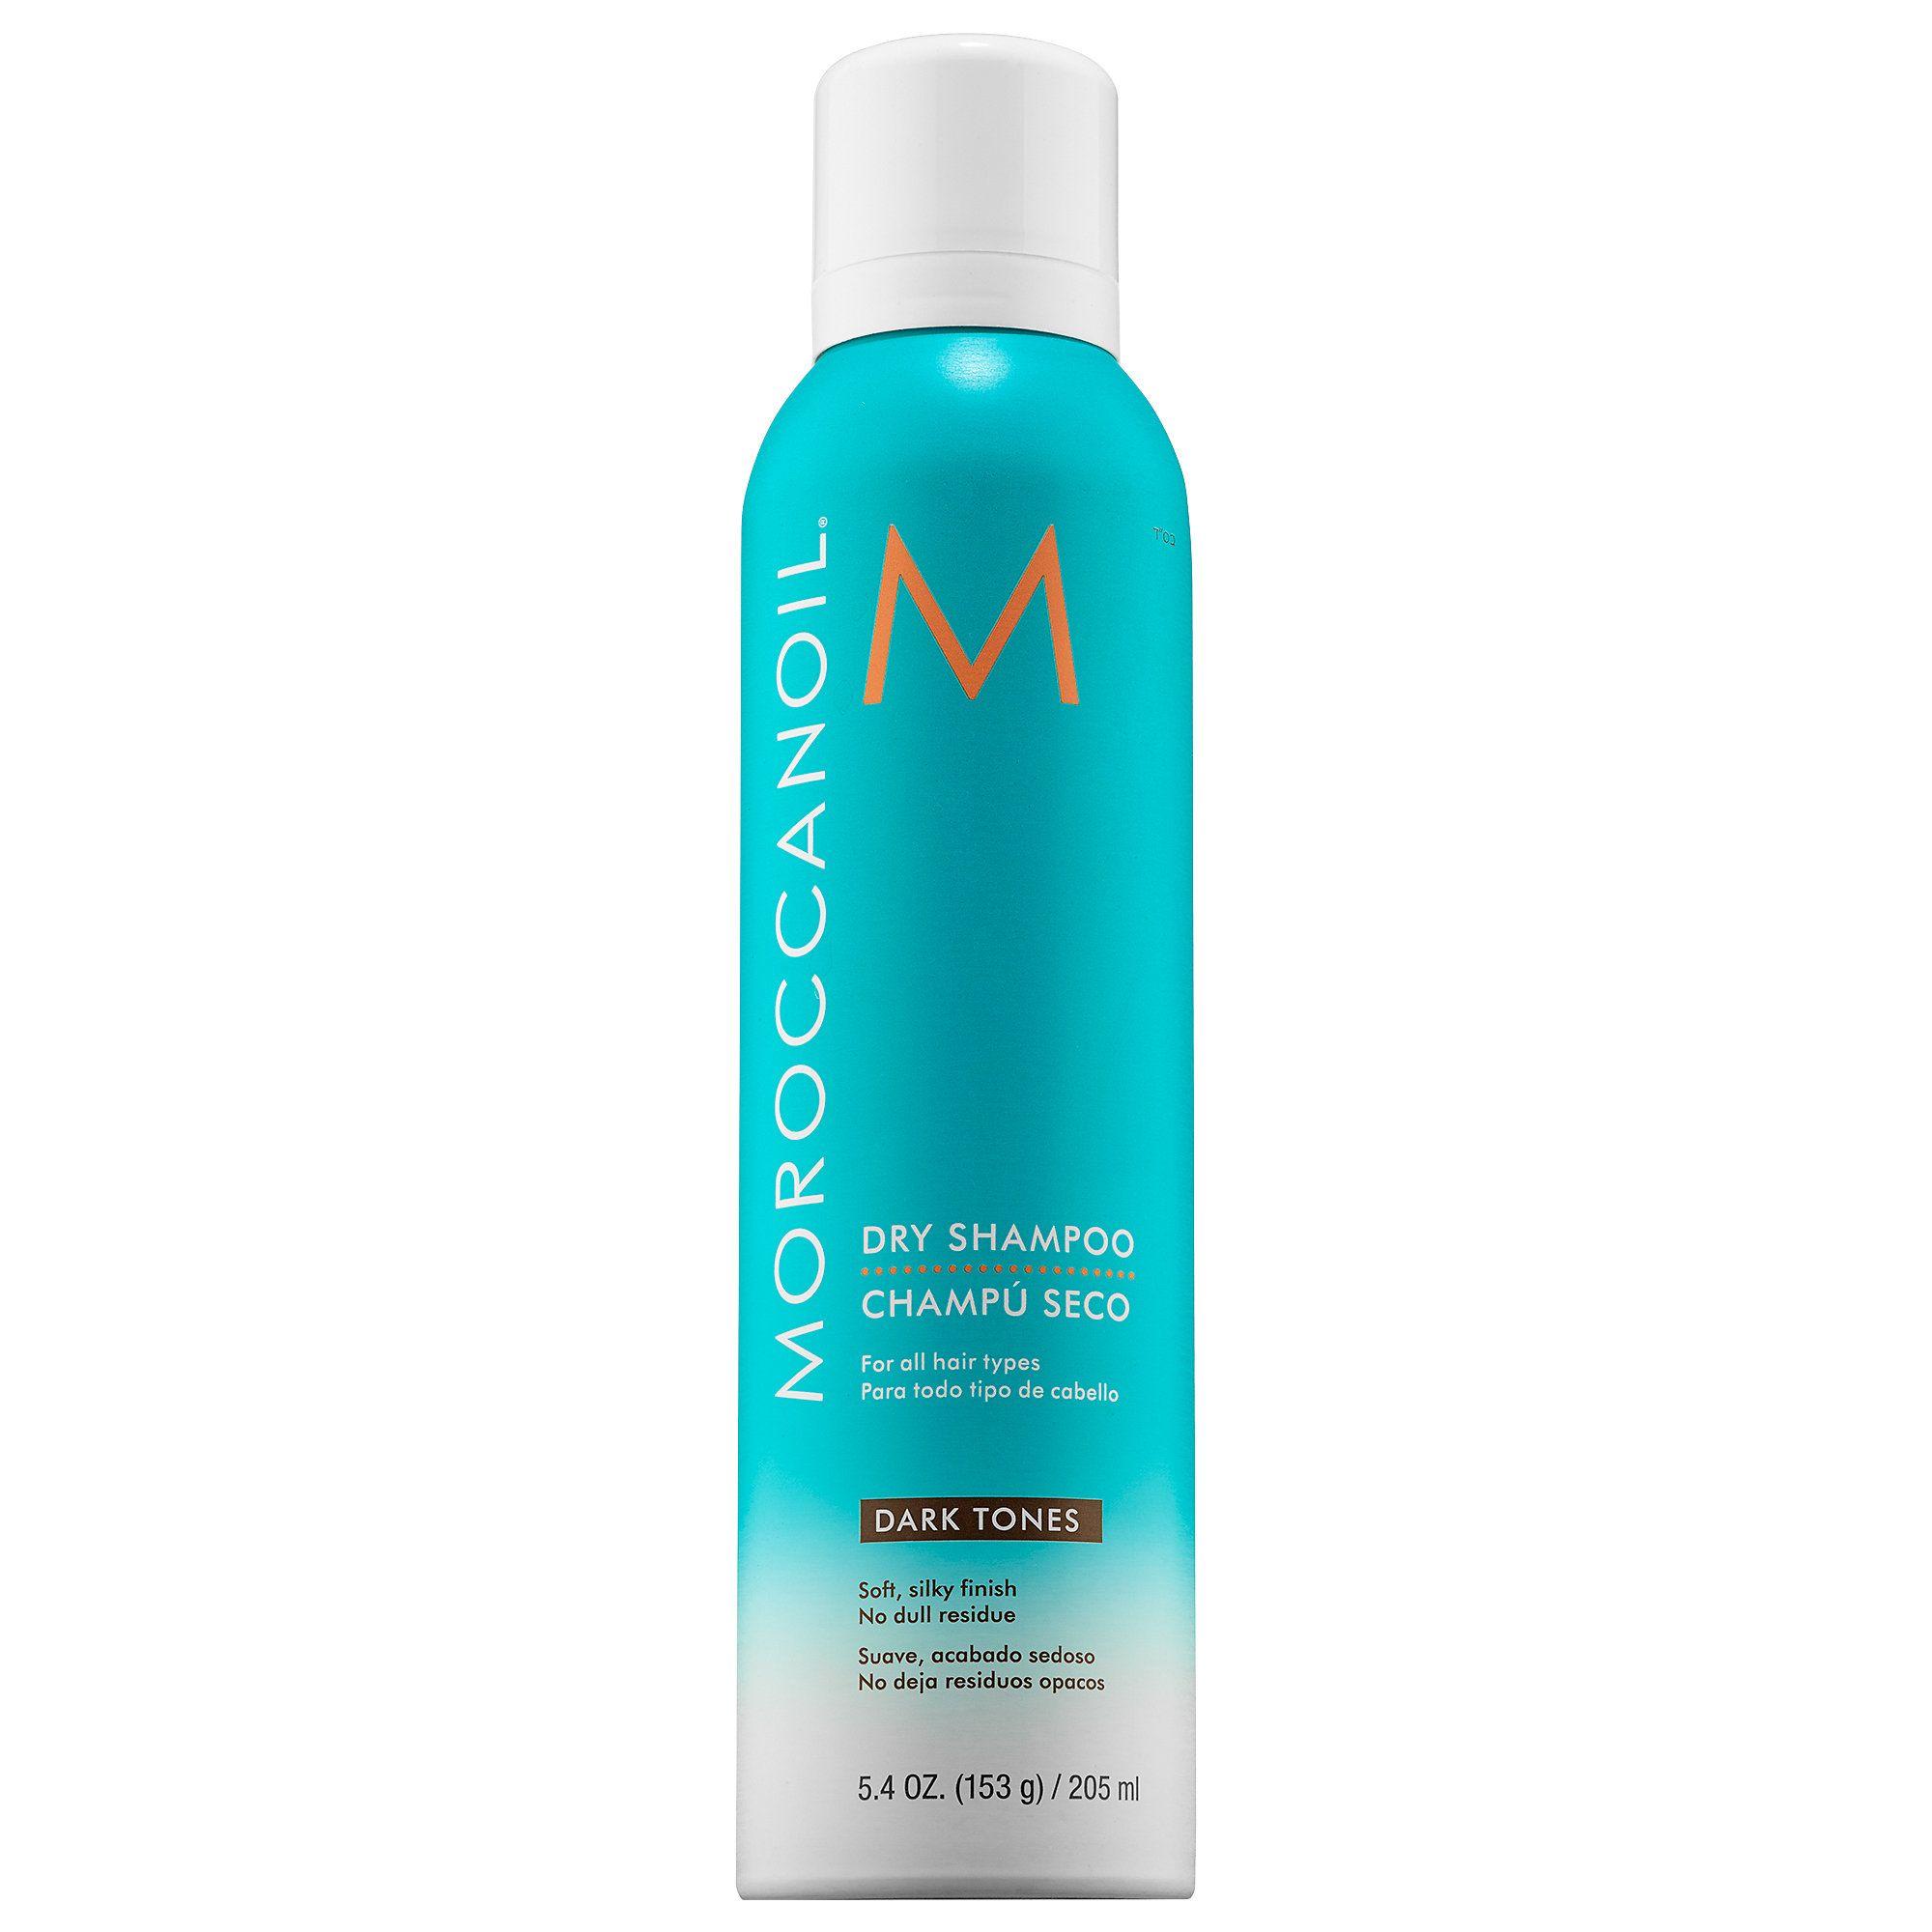 Shop Moroccanoil®'s Dry Shampoo Dark Tones at Sephora